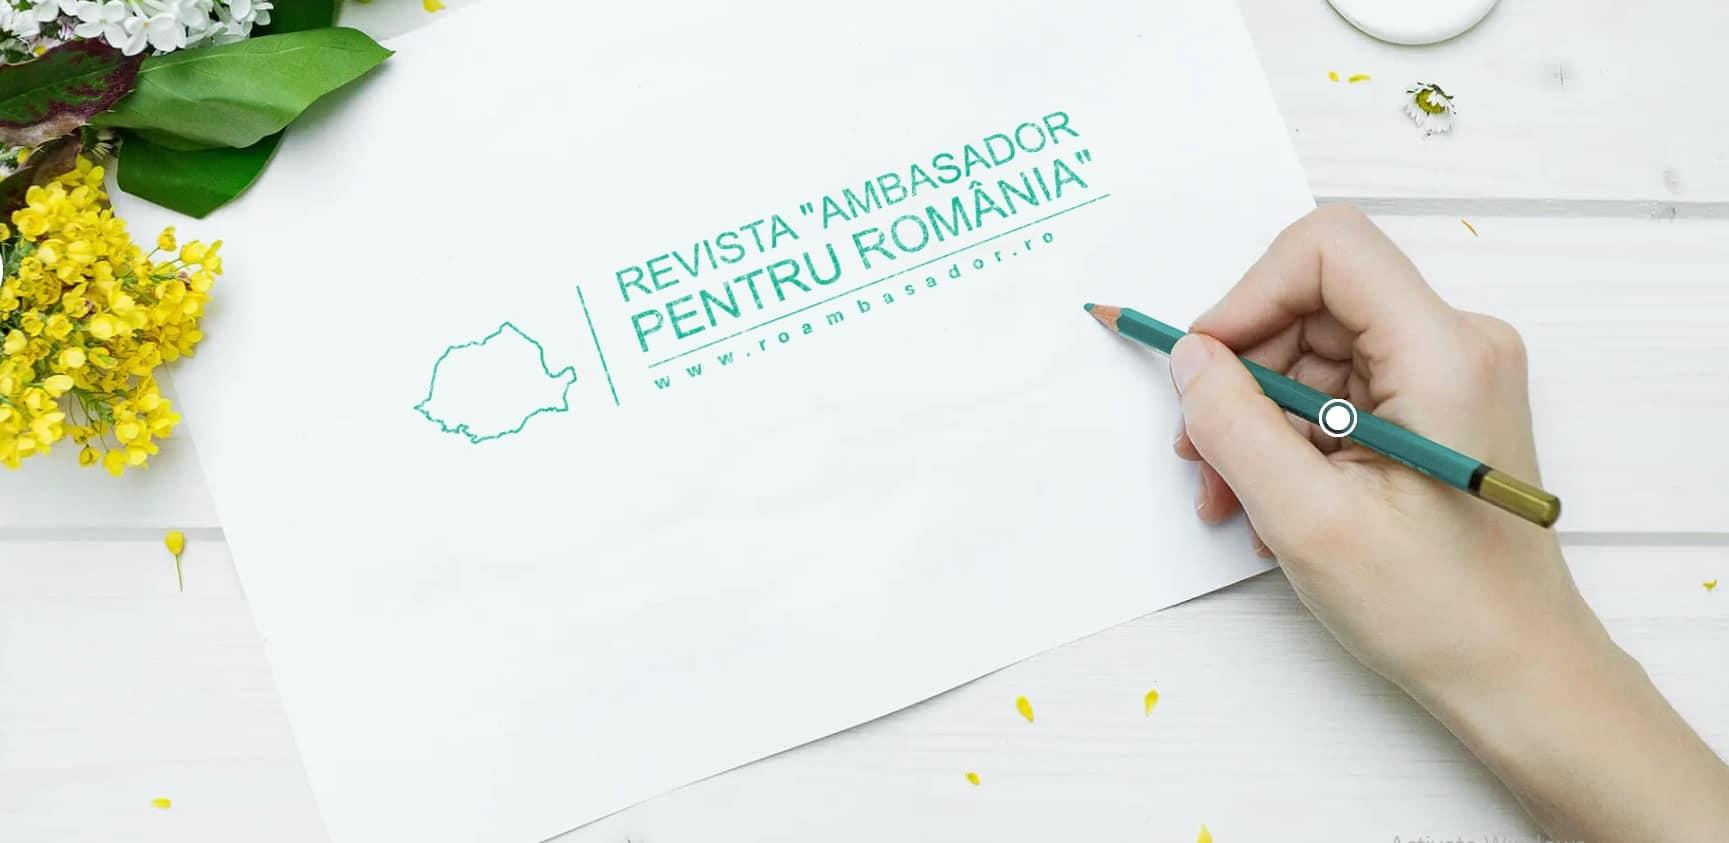 Ambasador pentru România